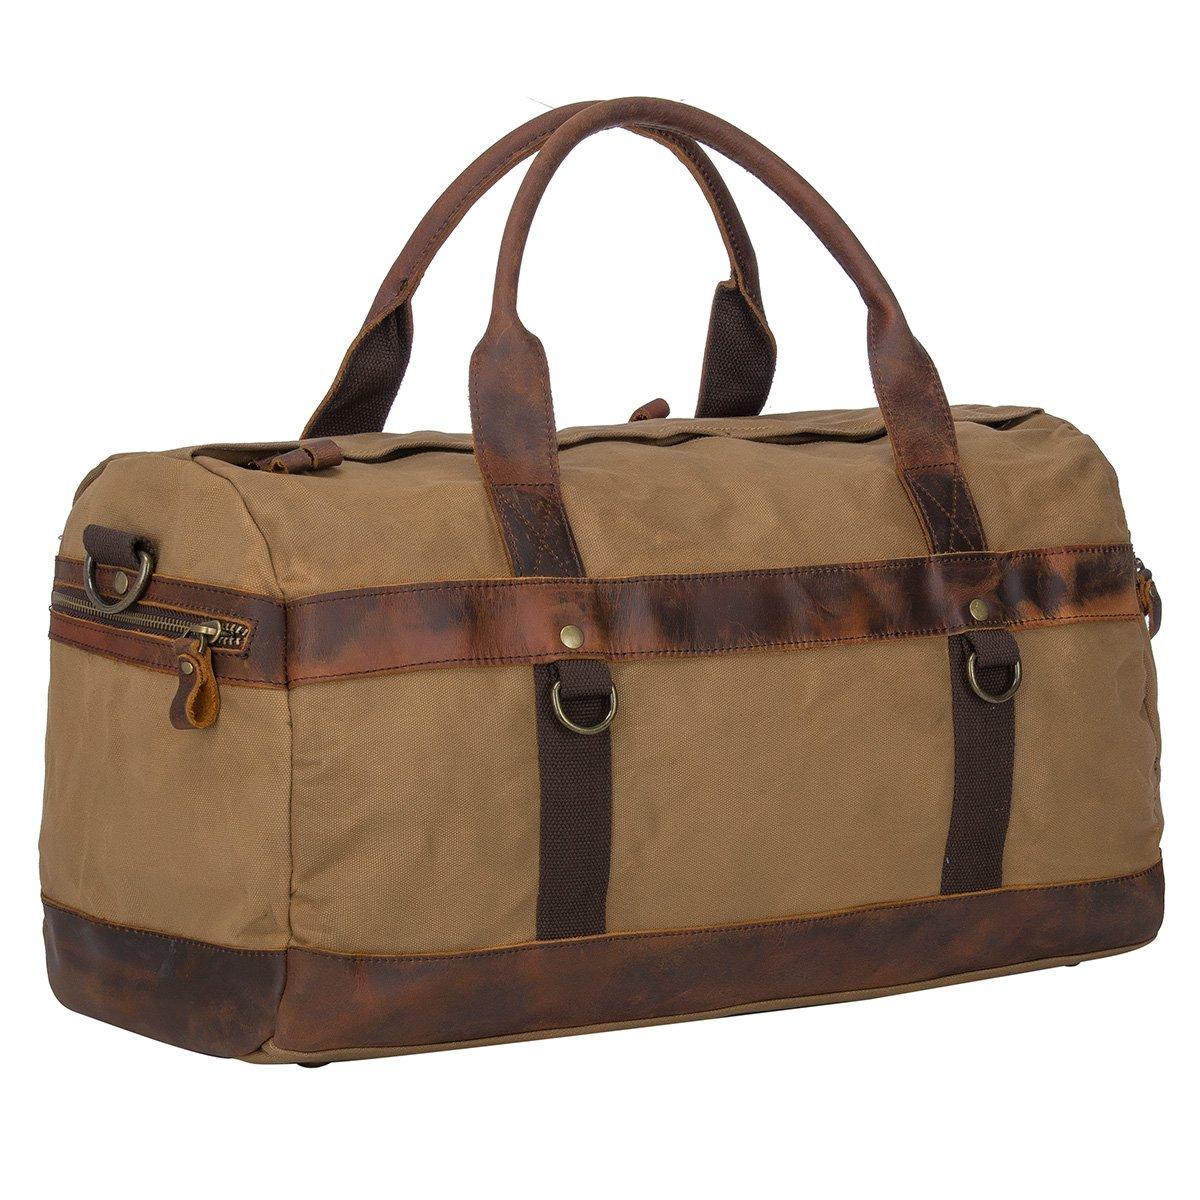 Travel Duffel Bag Waterproof Canvas Overnight Bag Oversized Genuine Leather Weekend Carryon Bag (Khaki)